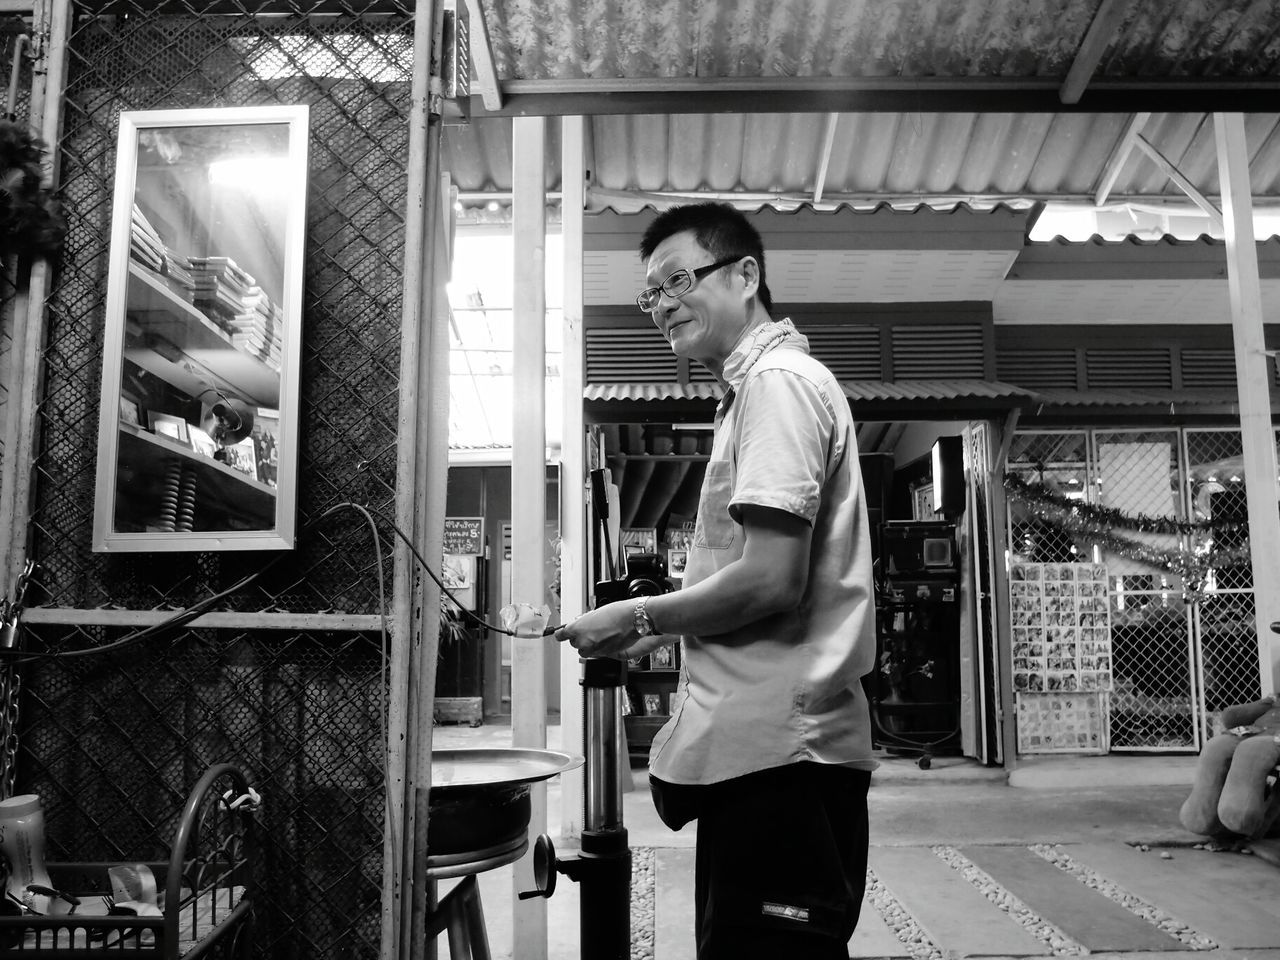 Good humour photographer at Kho kred market Phographer Good Humour Market Eyeemphotography Eyeem Black & White Eyeem Market